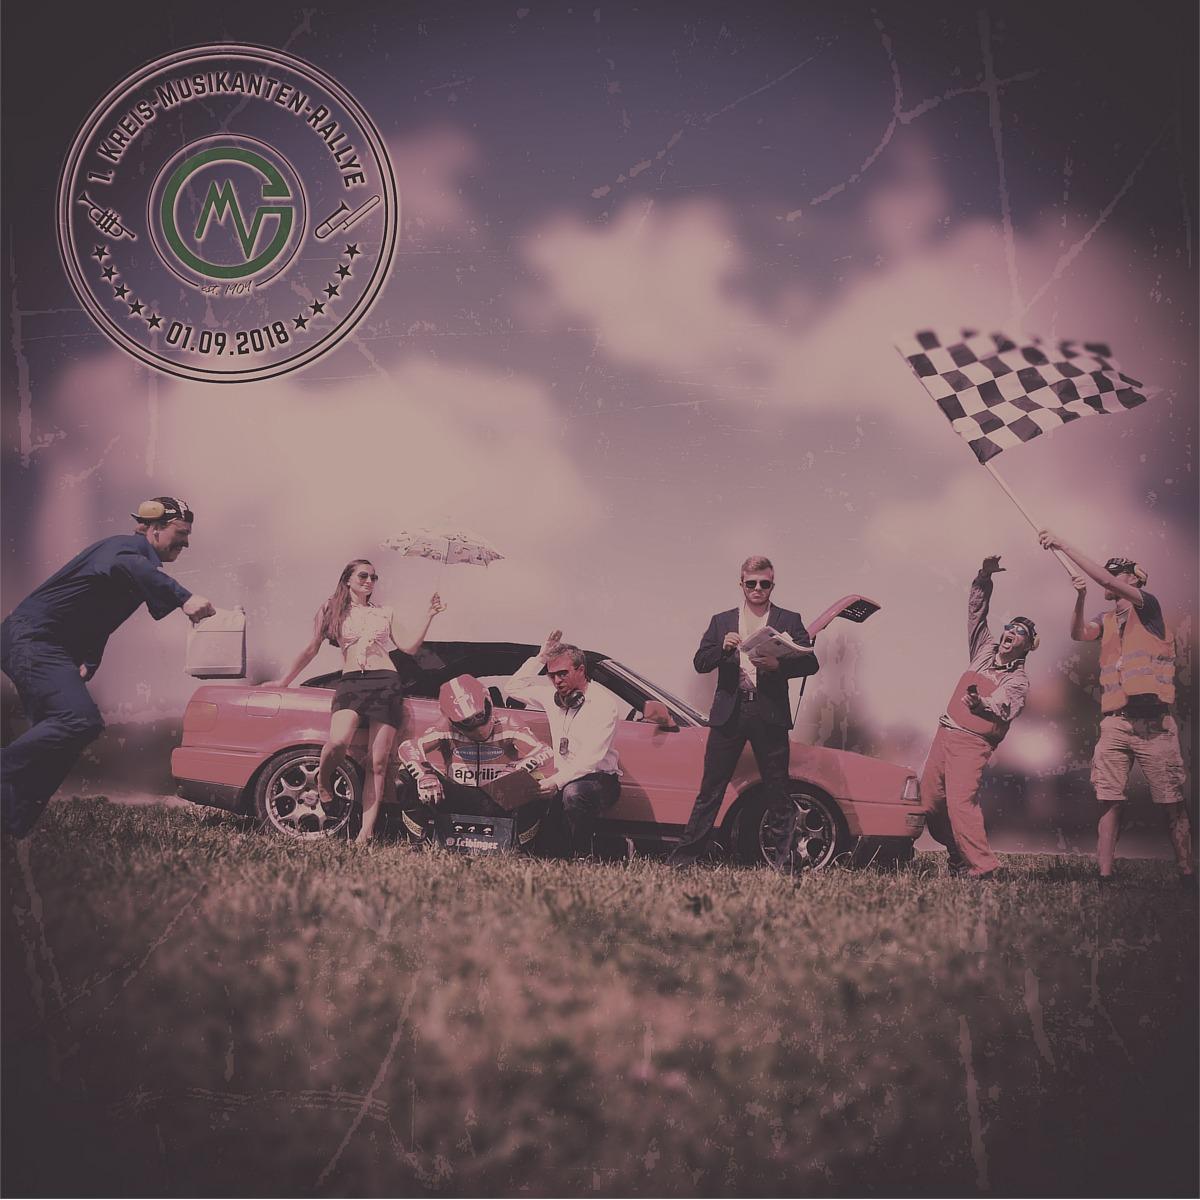 2. Testdurchlauf Musikanten Rallye 2018